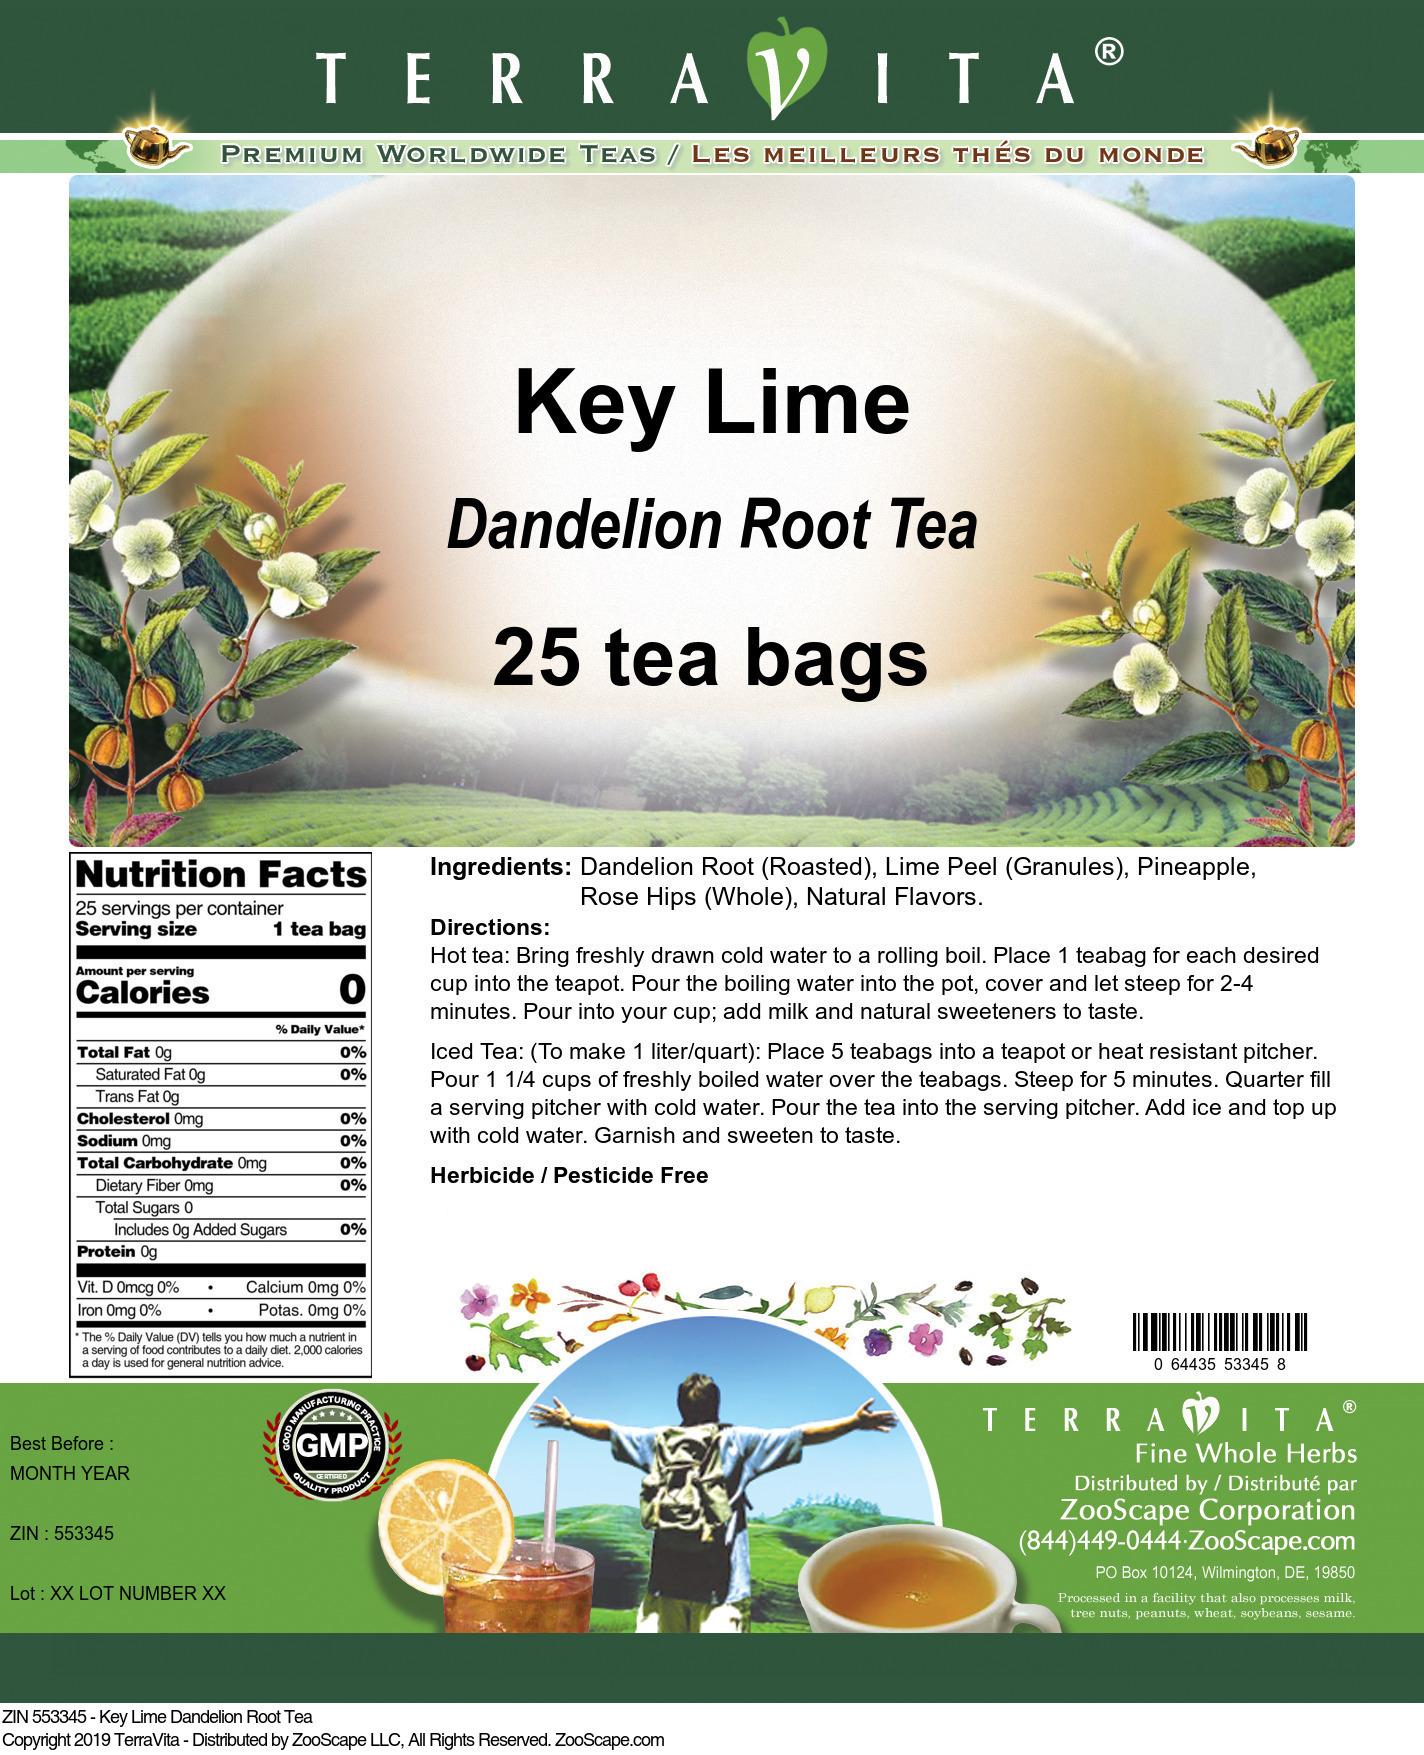 Key Lime Dandelion Root